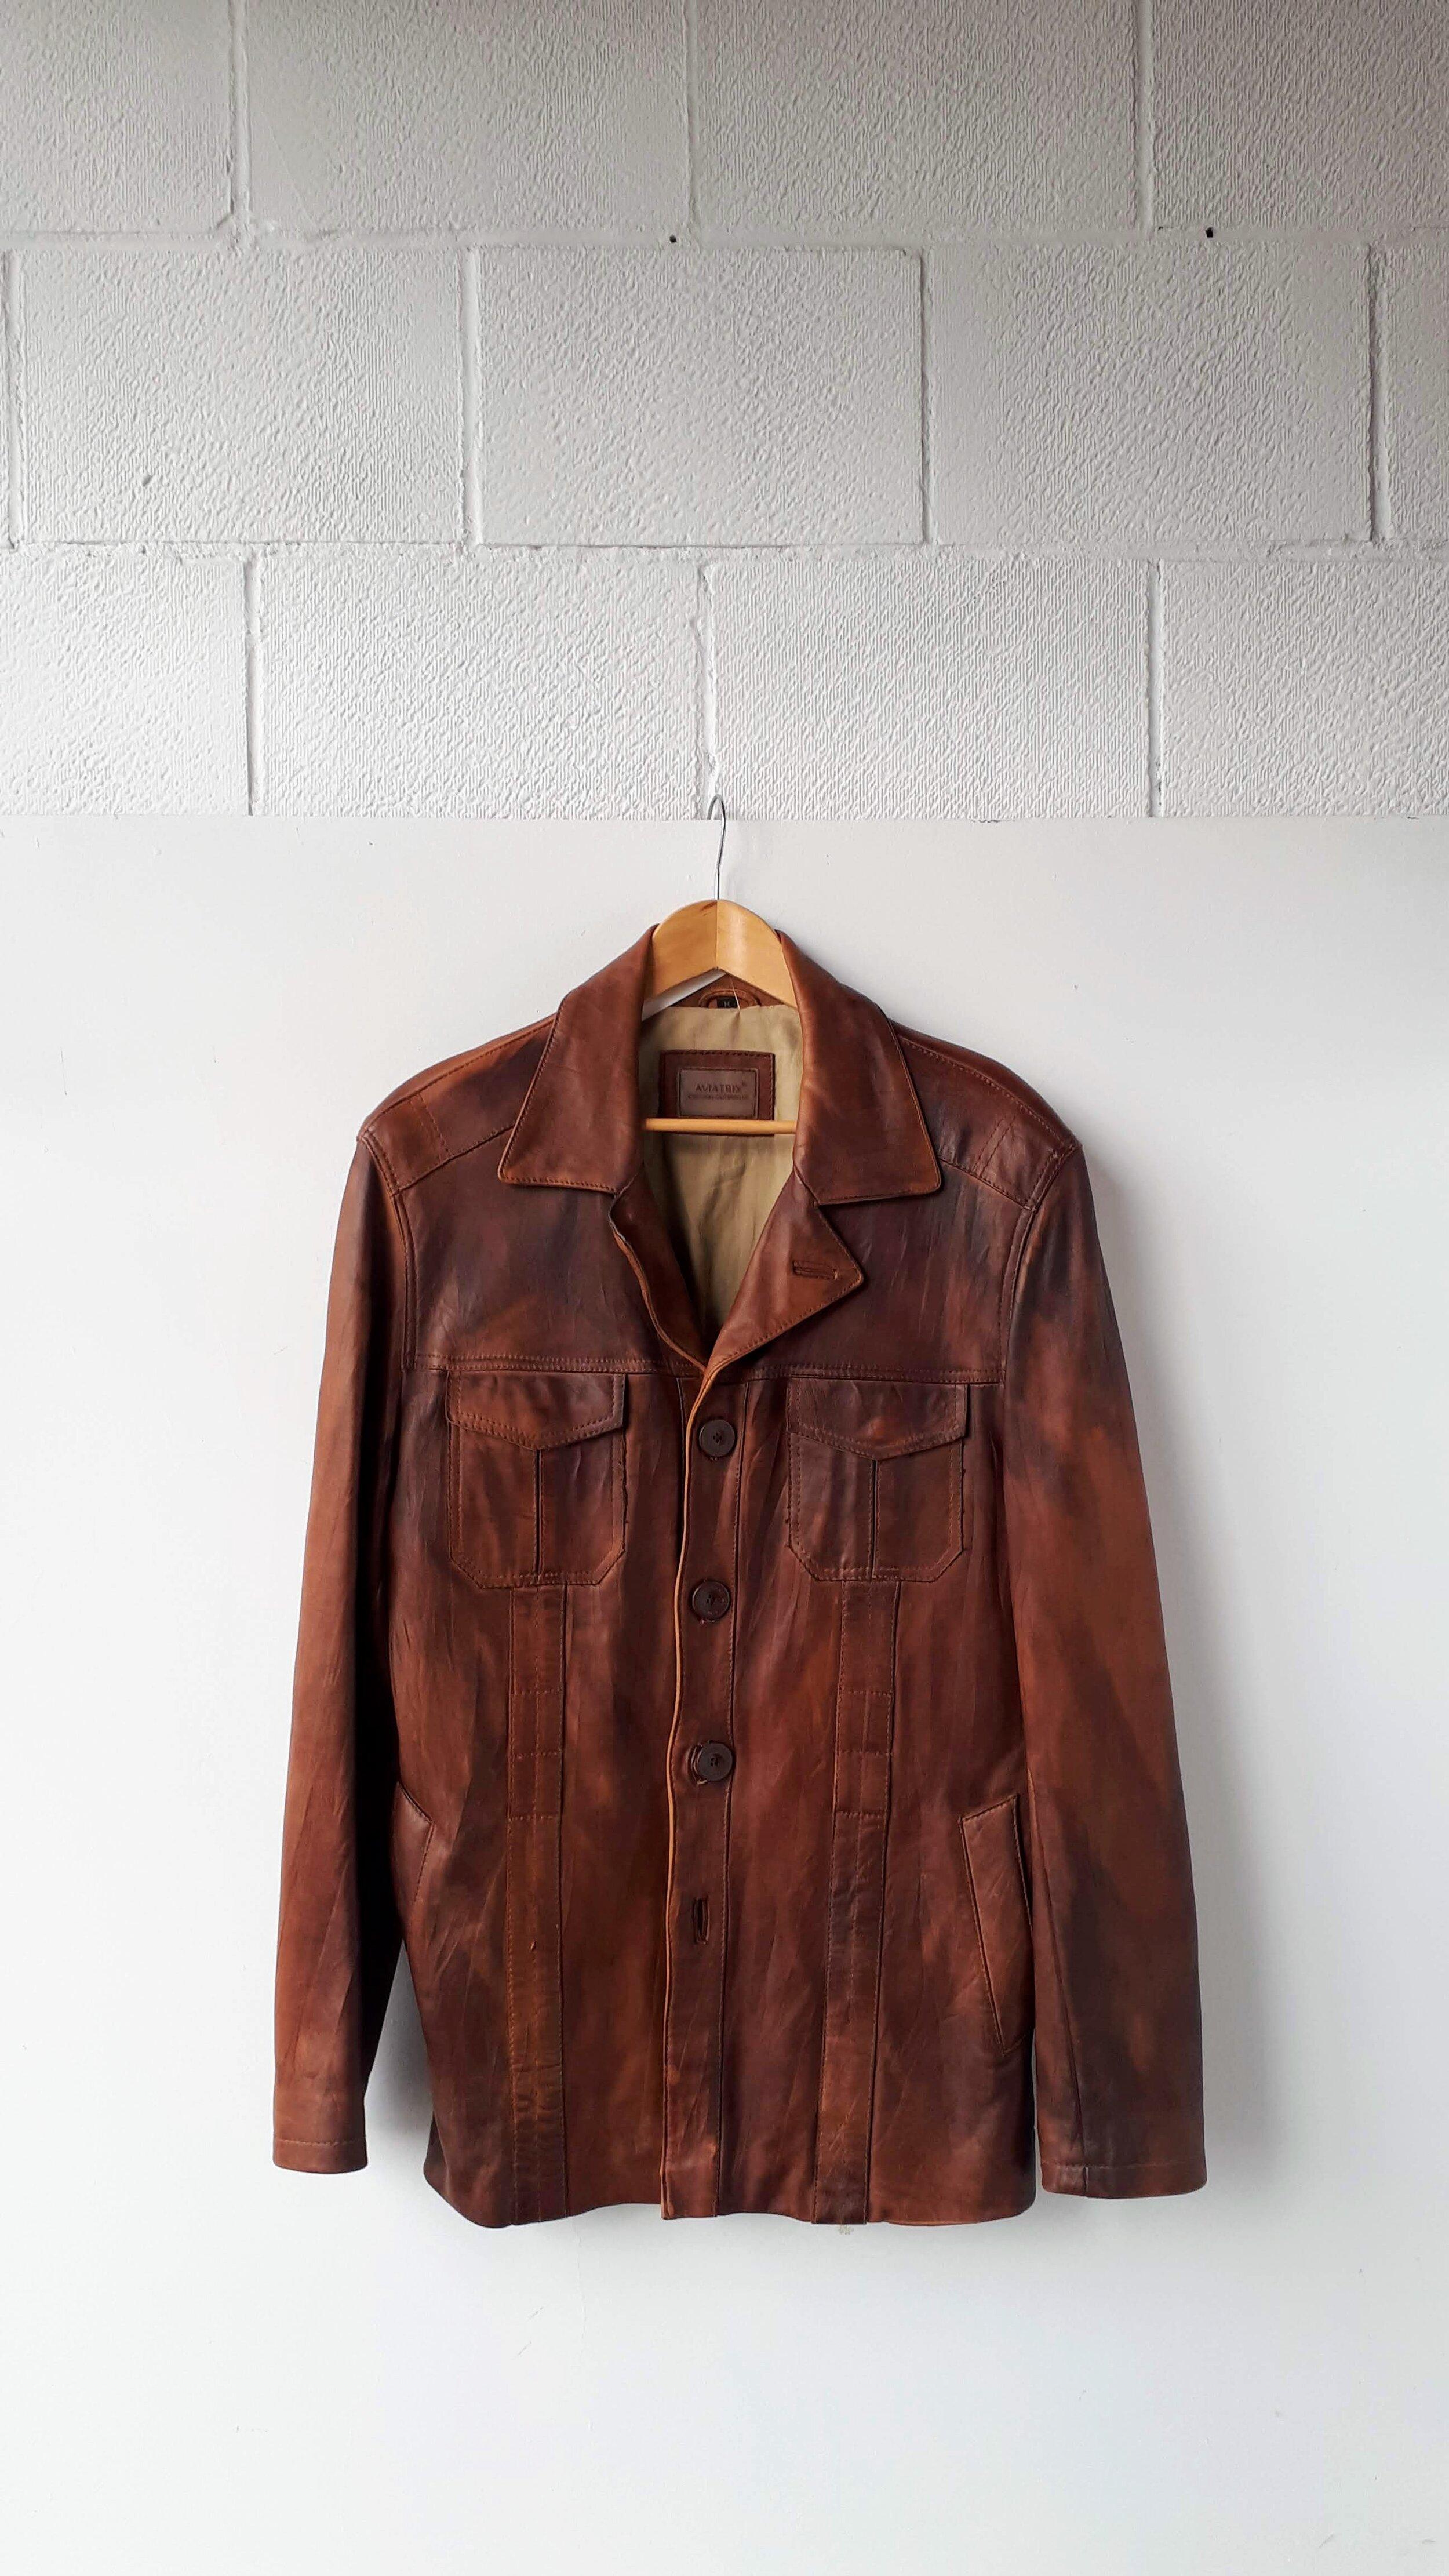 Leather coat; Men's size M, $62